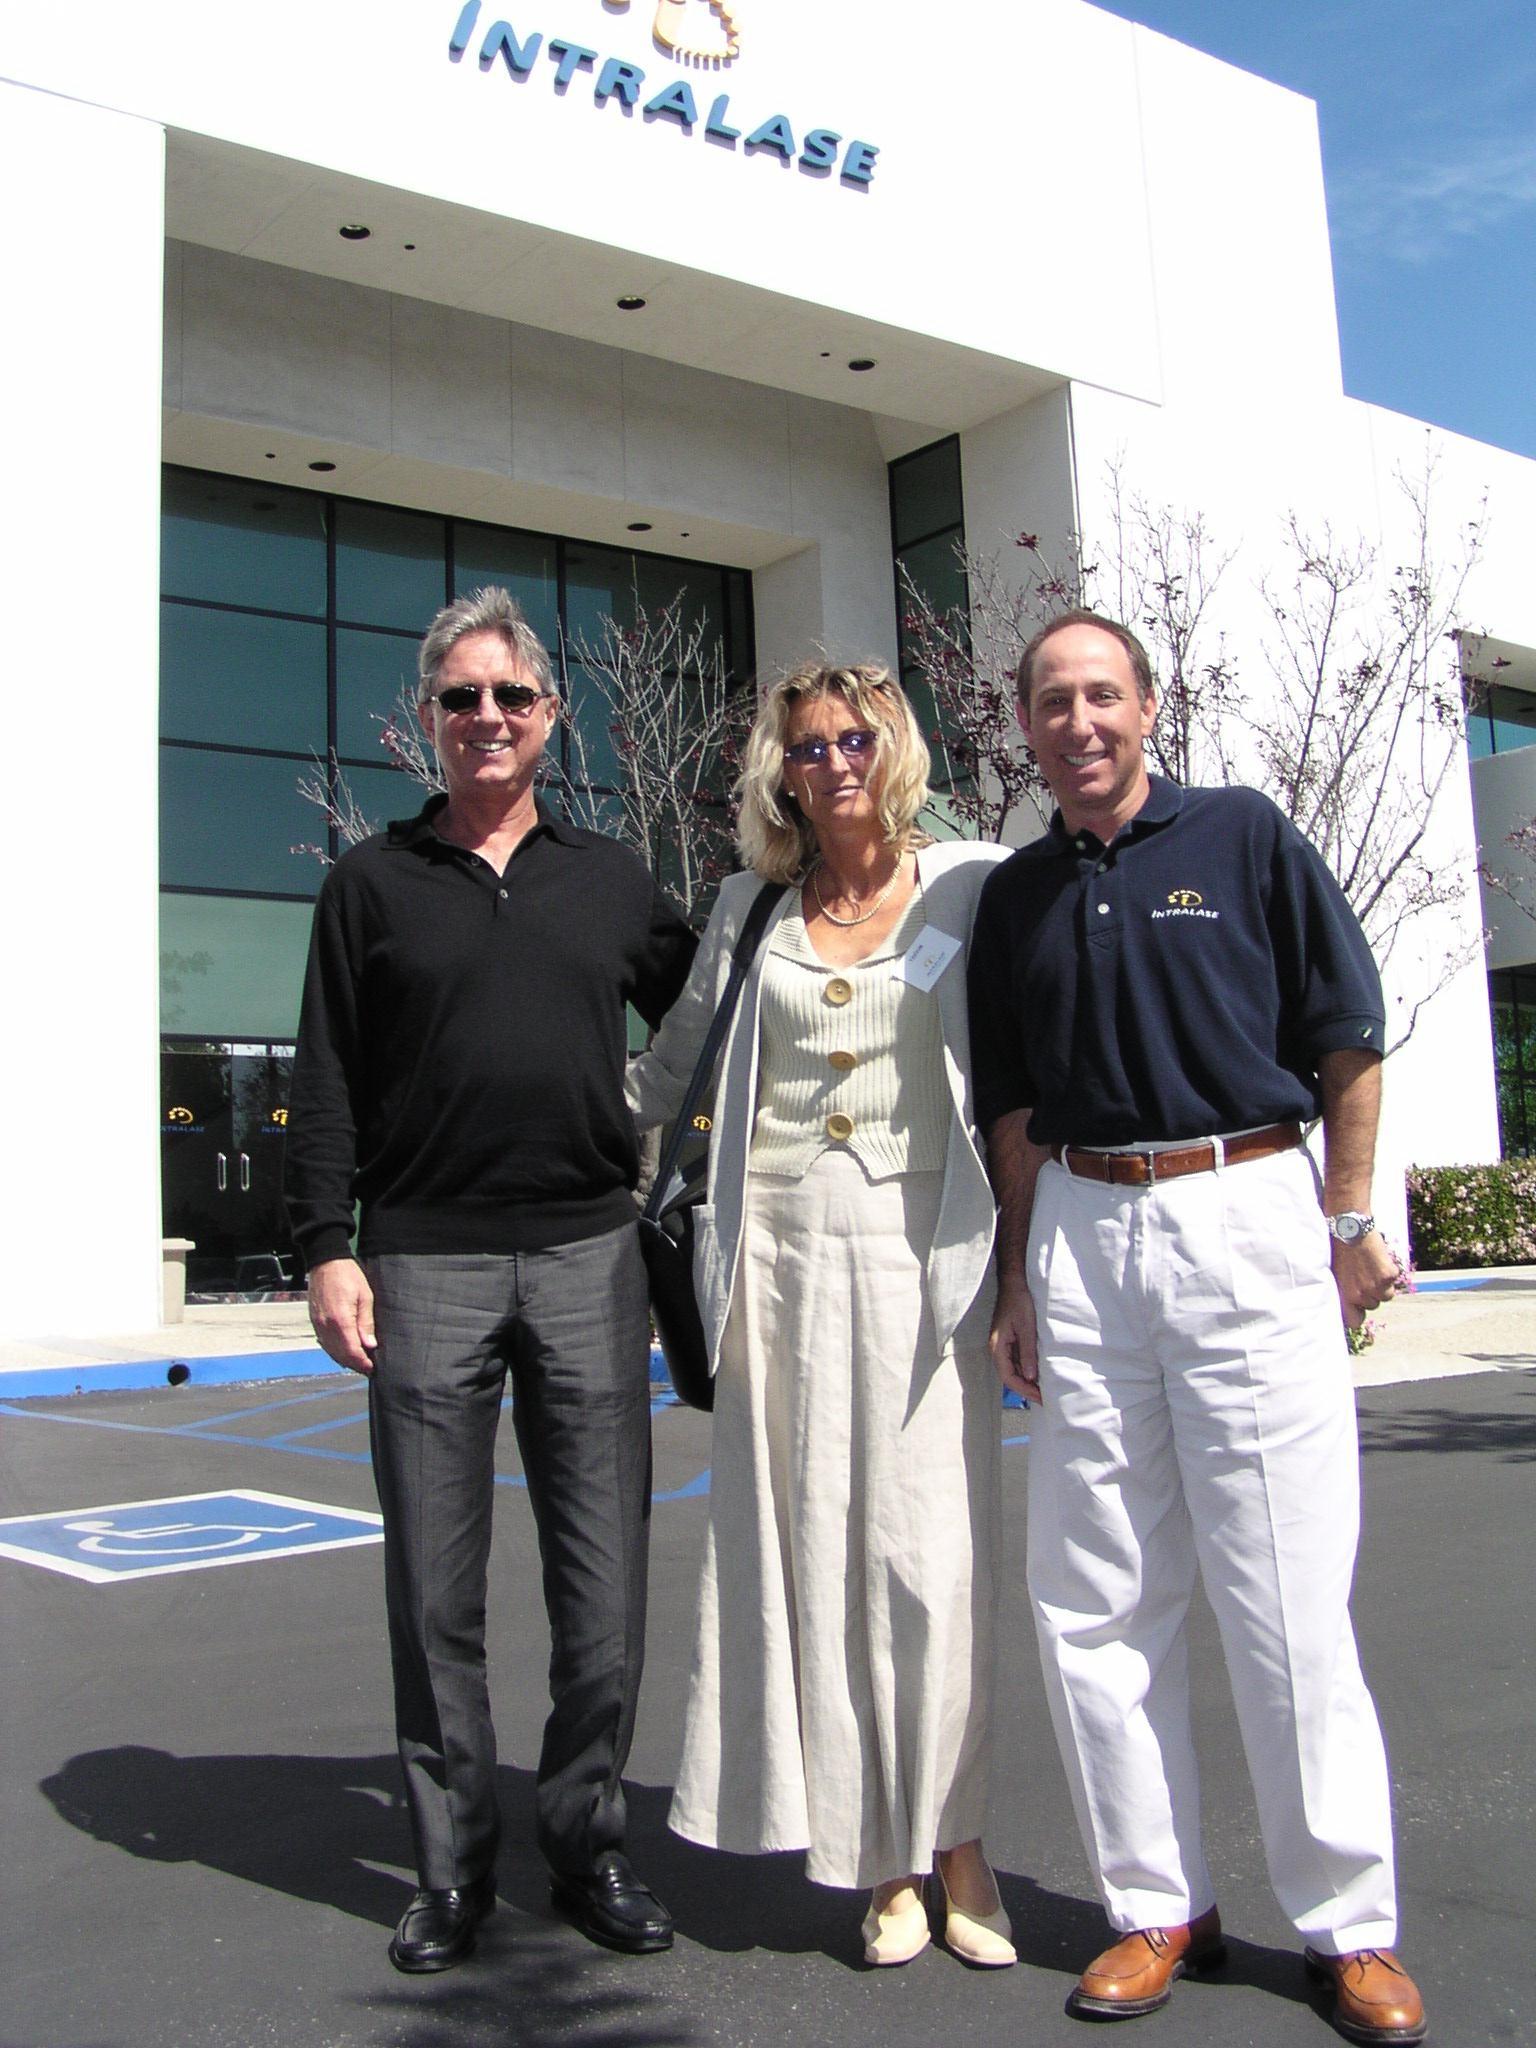 Randy Alexander, Imola Ratkay-Traub, Eric Weinberg, IntraLase Irvine USA